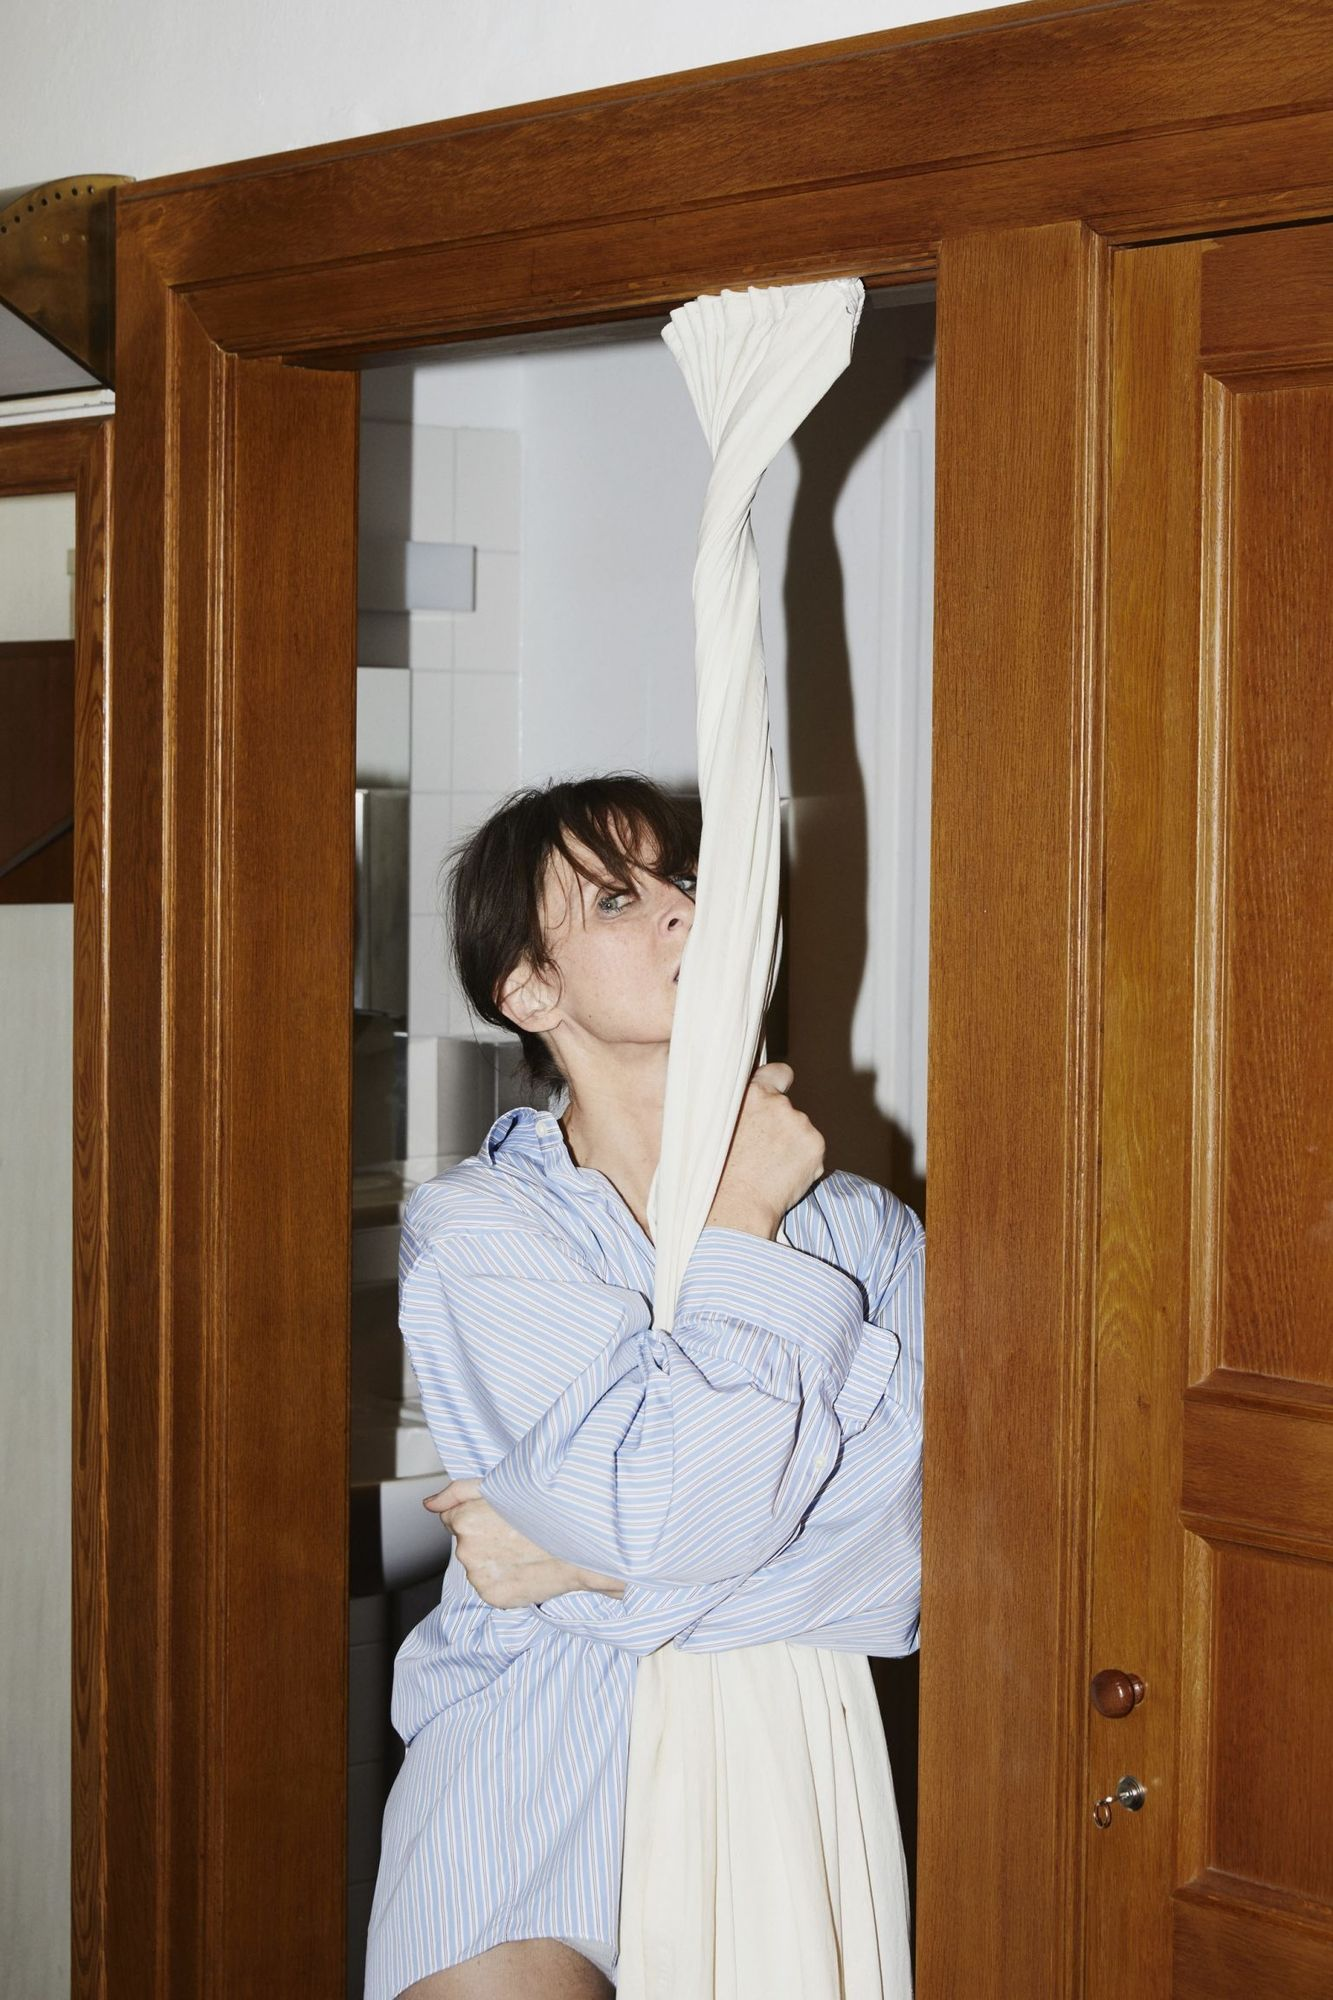 LIGANORD ARTIST HELENA NARRA / HAIR MAKE-UP - SOPHIE ROIS / DIE DAME